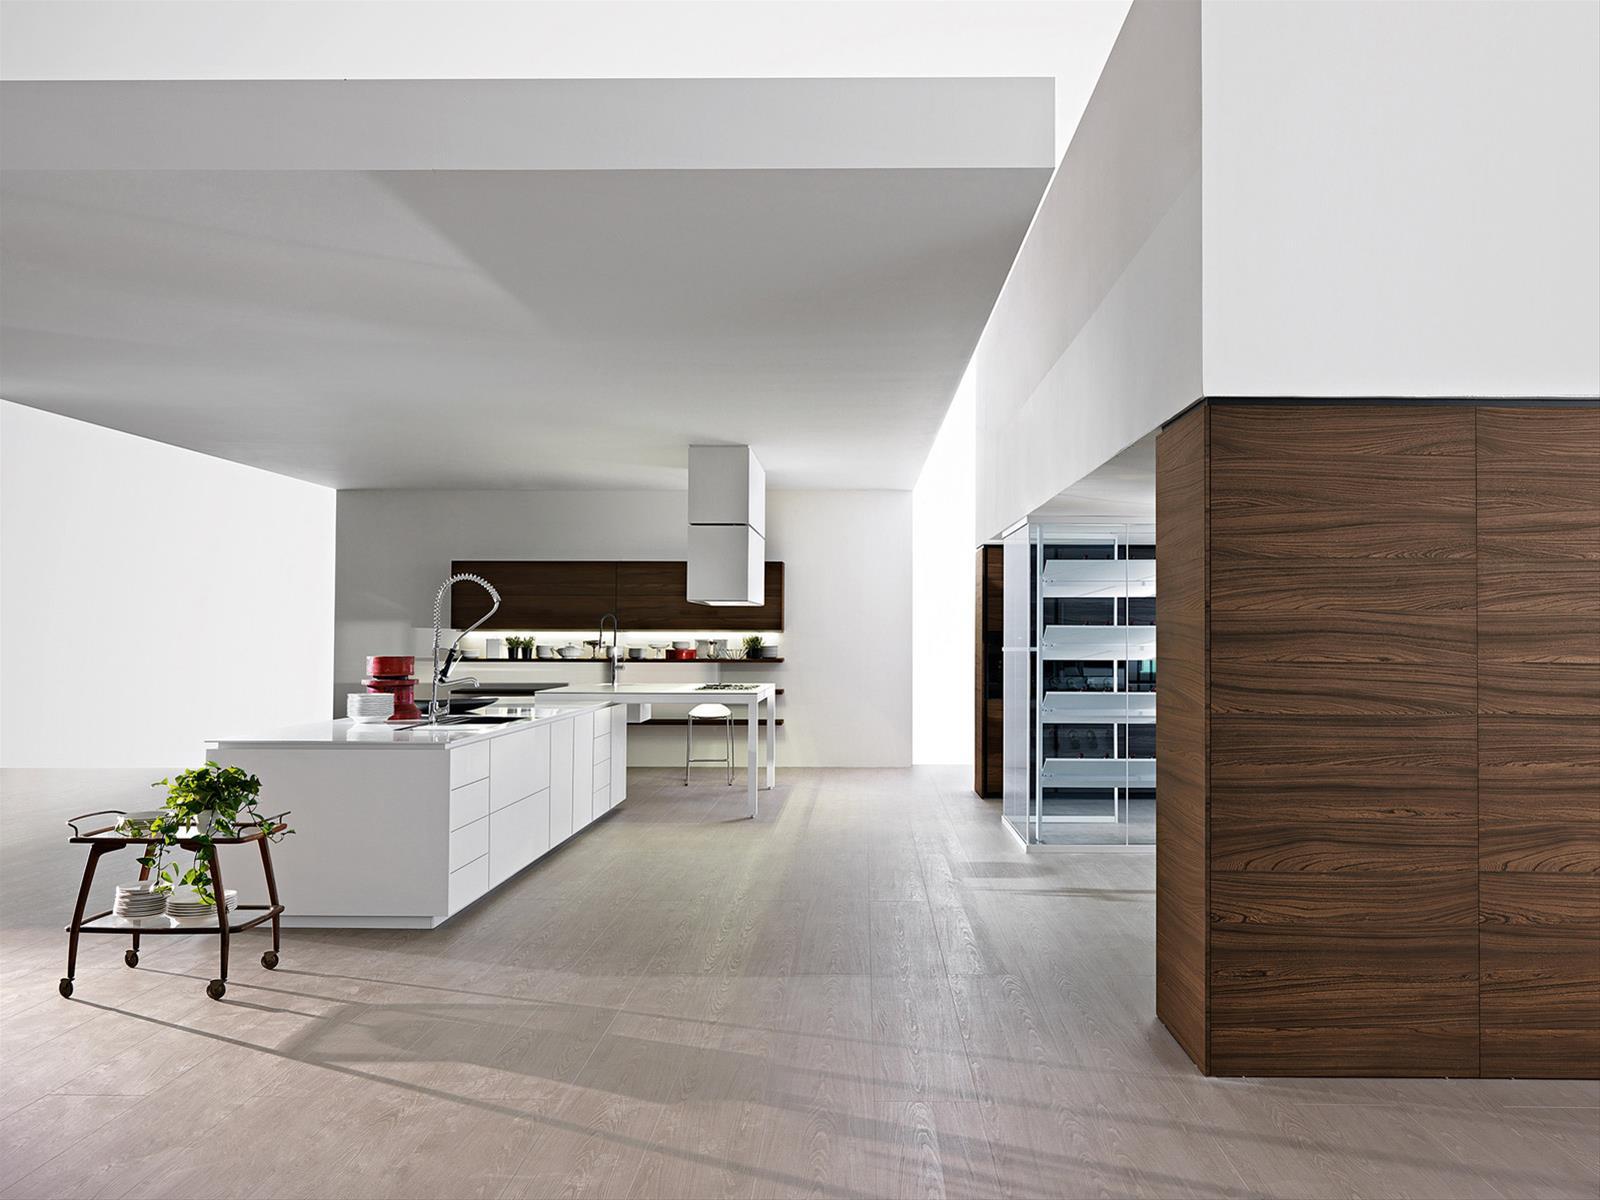 Banco dada cucine cucine italiane moderne luca meda for Cucine italiane design moderne